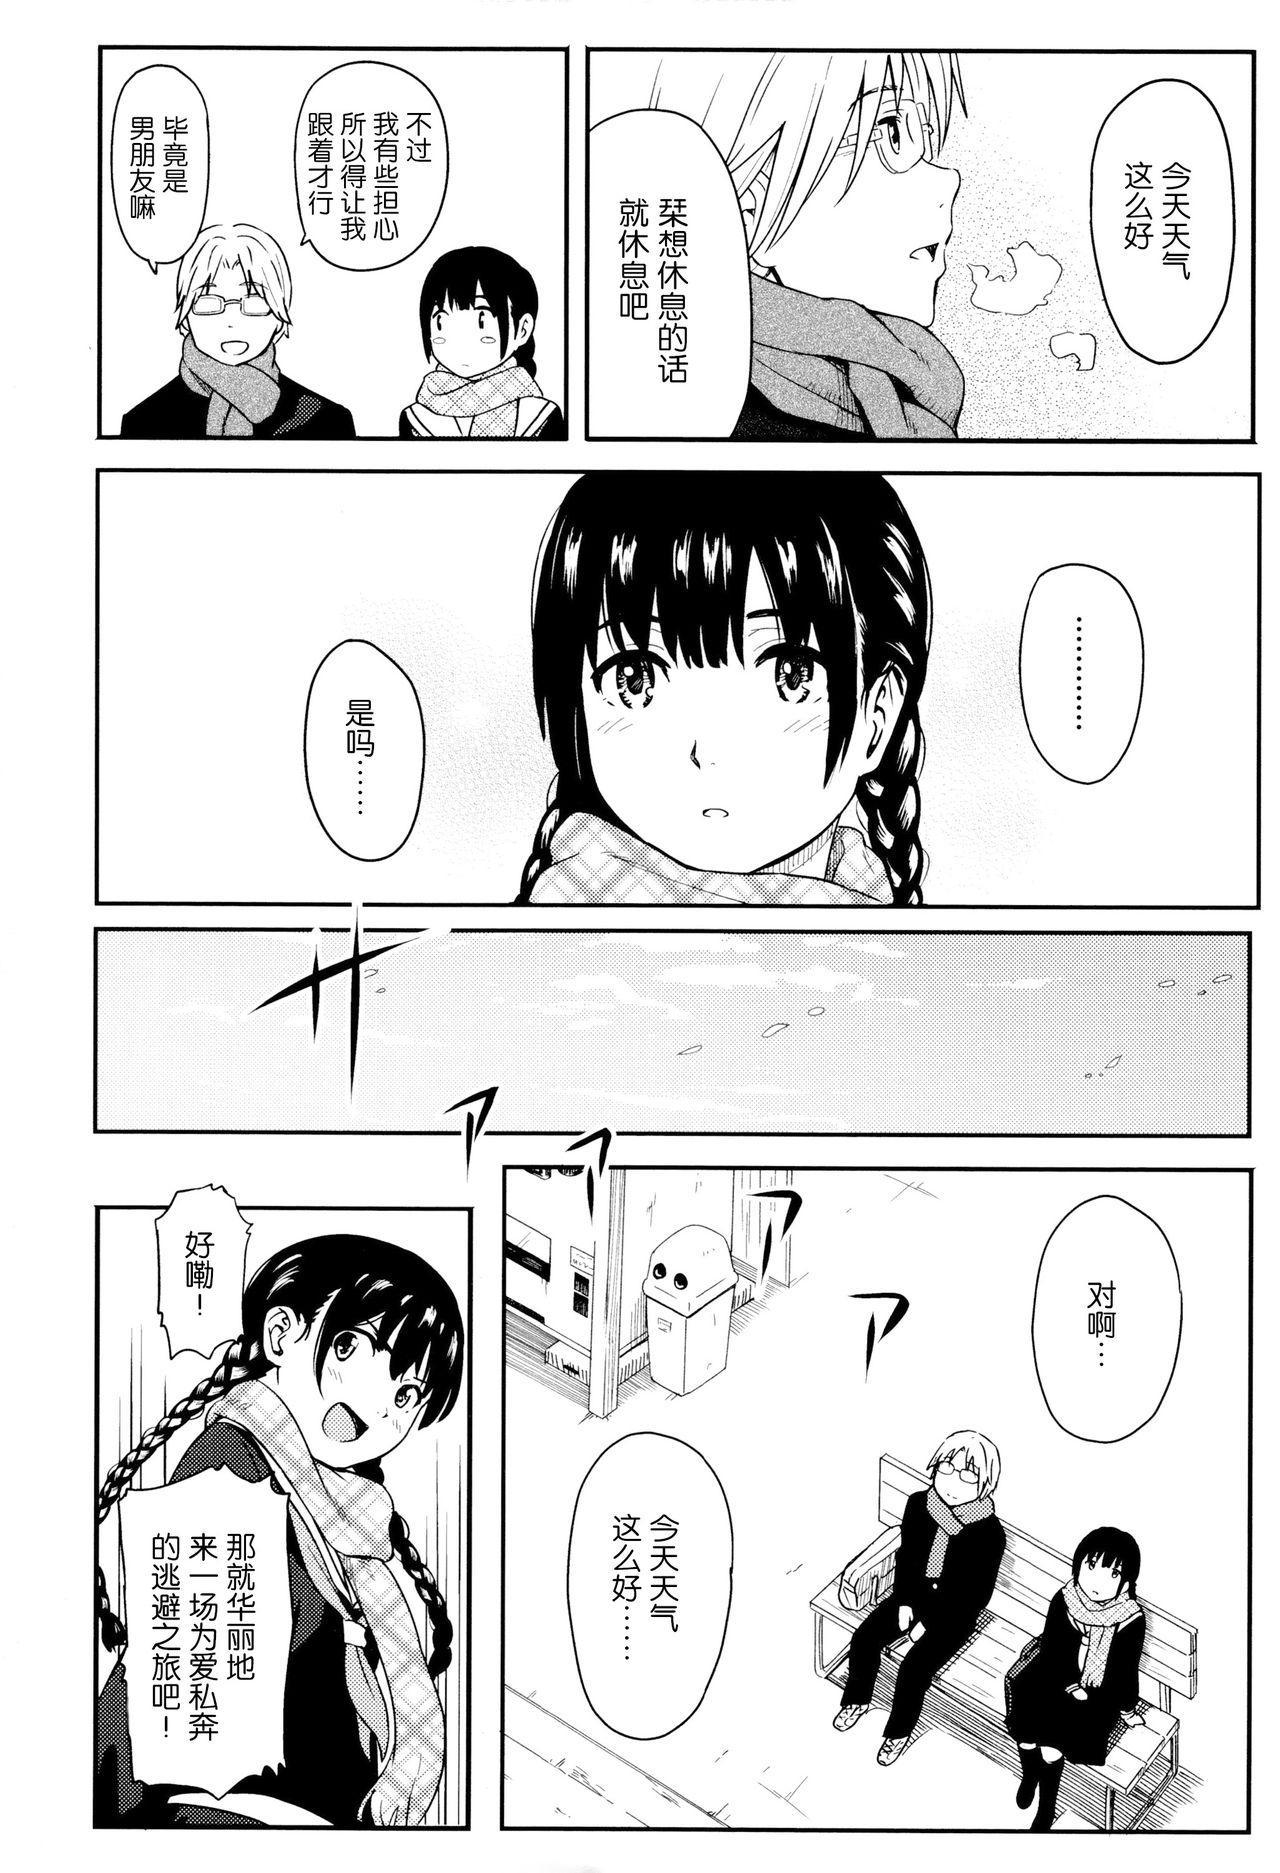 Tokubetsu na Mainichi - Special daily 96